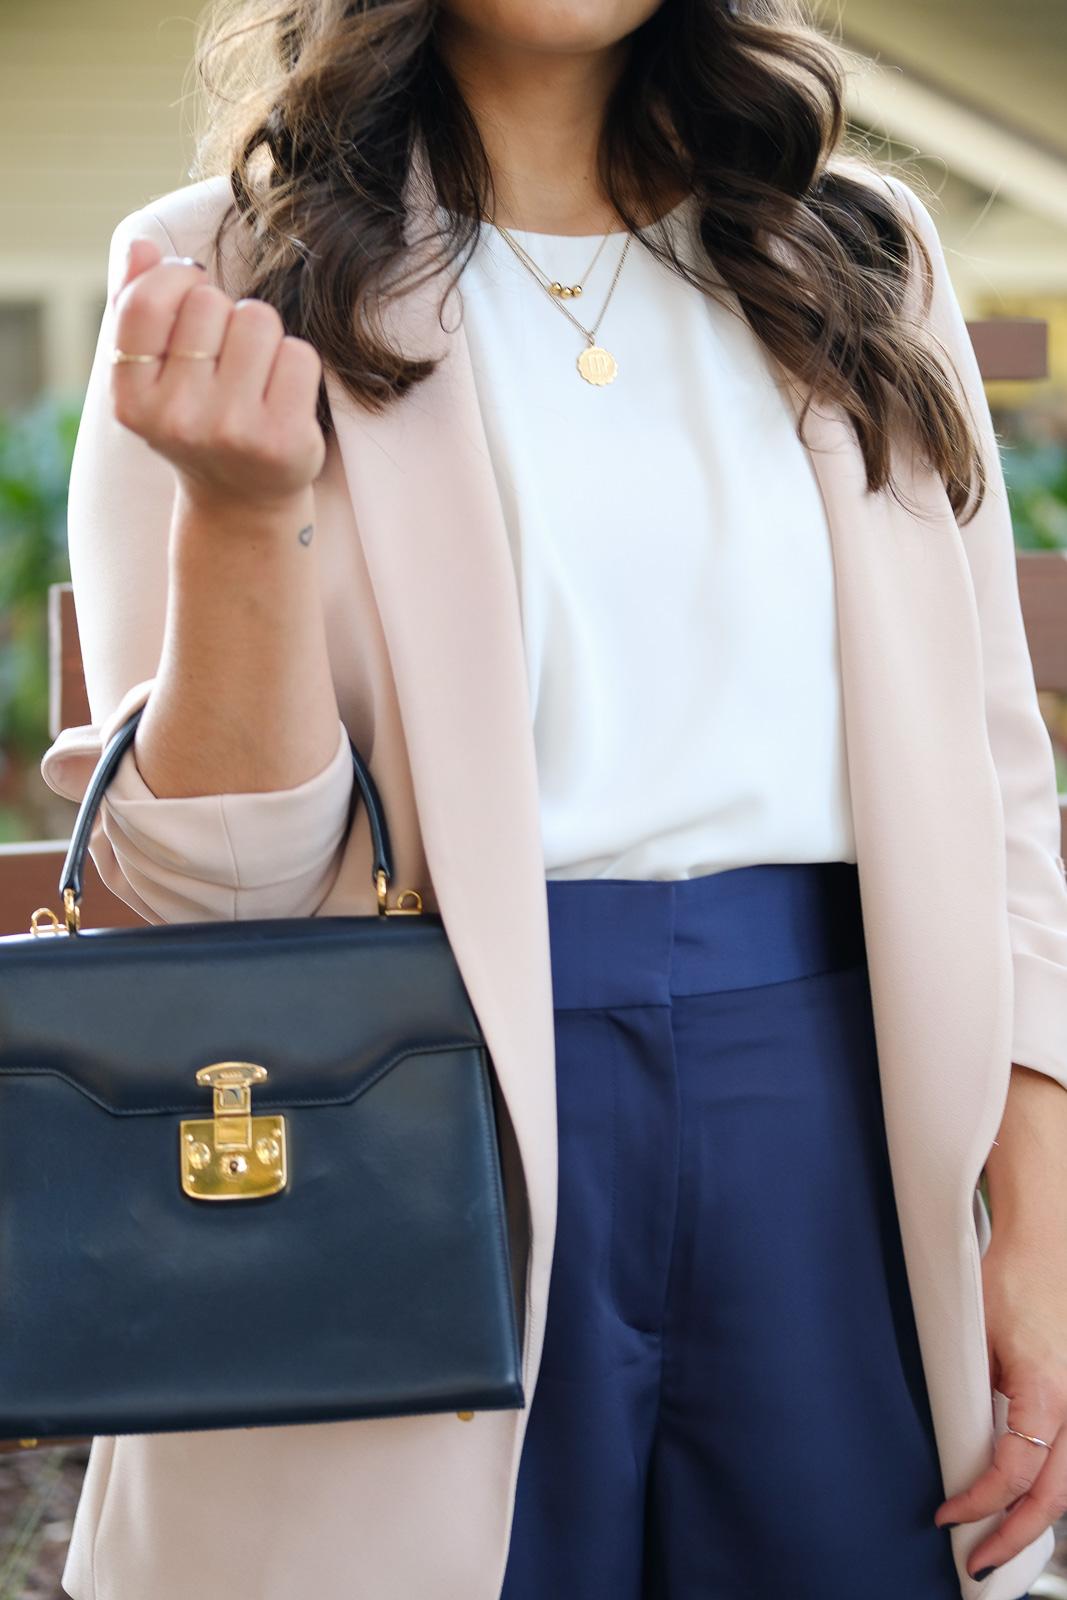 Pink blazer and navy handbag layered necklaces